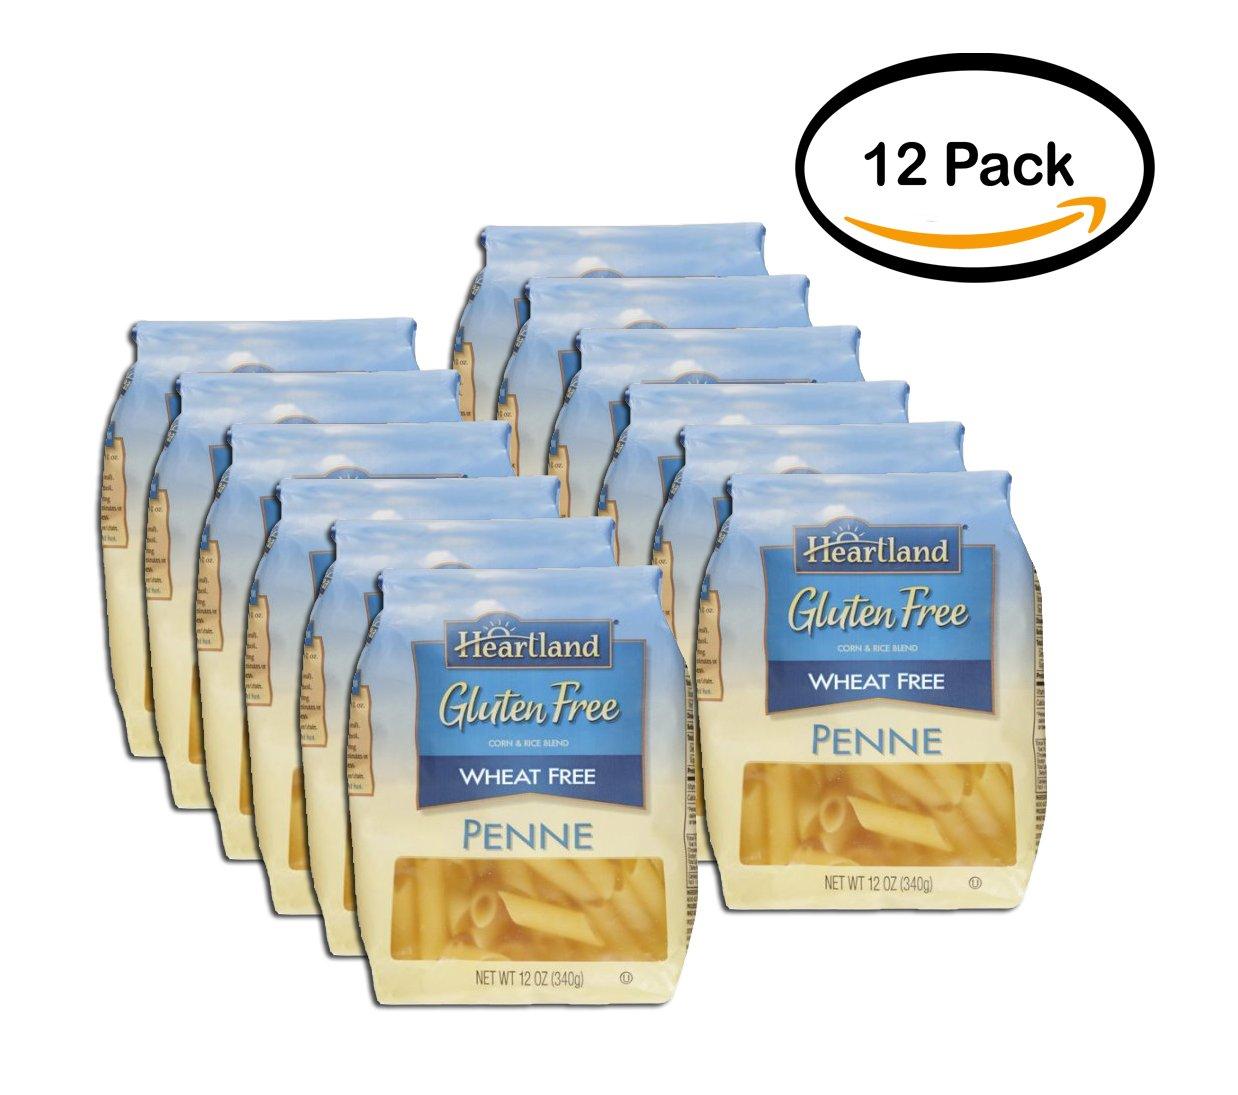 PACK OF 12 - Heartland Gluten-Free Penne Pasta, 12 oz by HEARTLAND